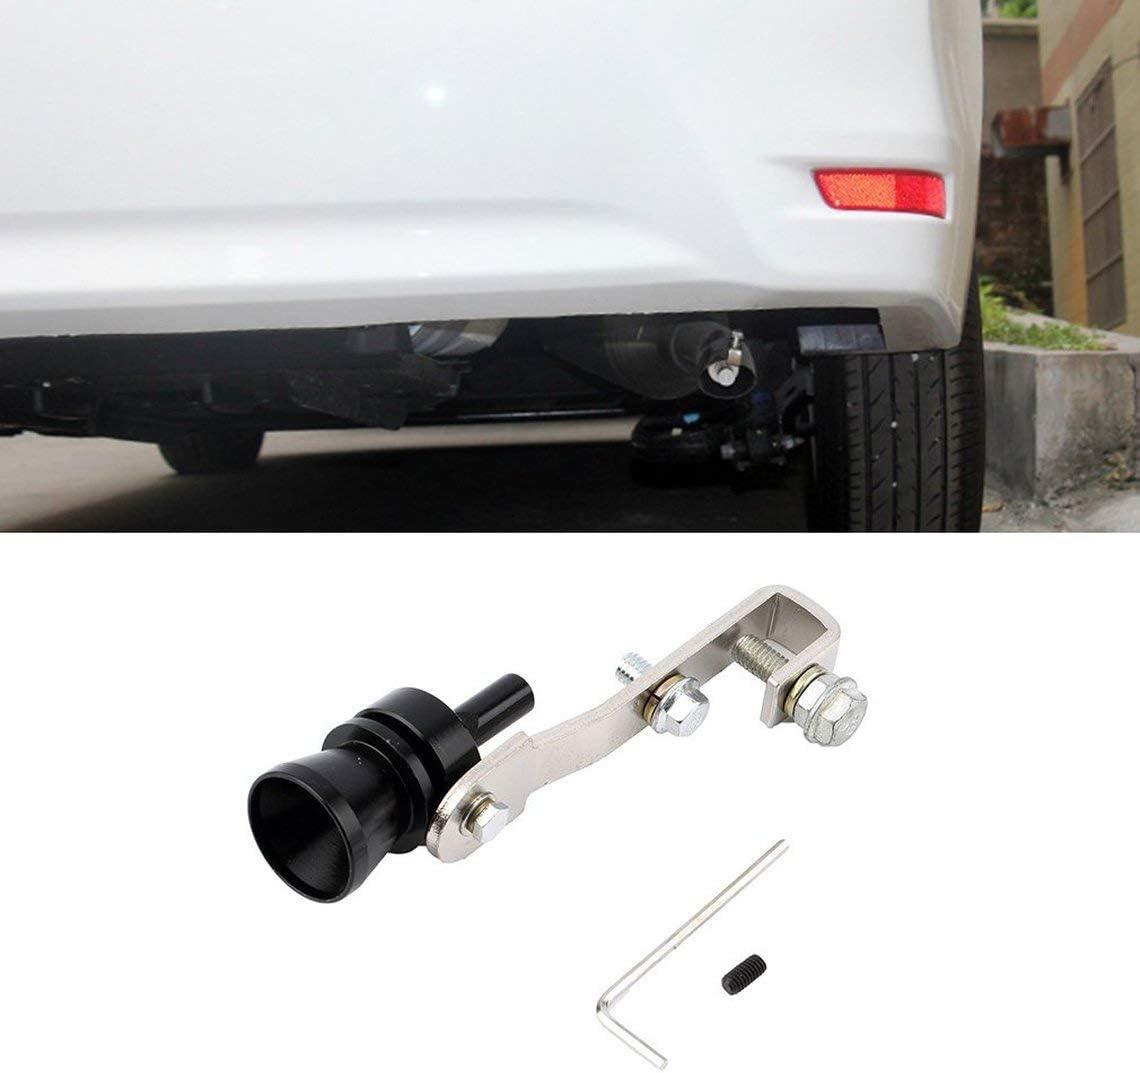 Zinniaya Universal de aluminio Cars Auto BOV Turbo Sound Whistle Tube Simulador de sonido Tubo de escape Tubo de silenciador